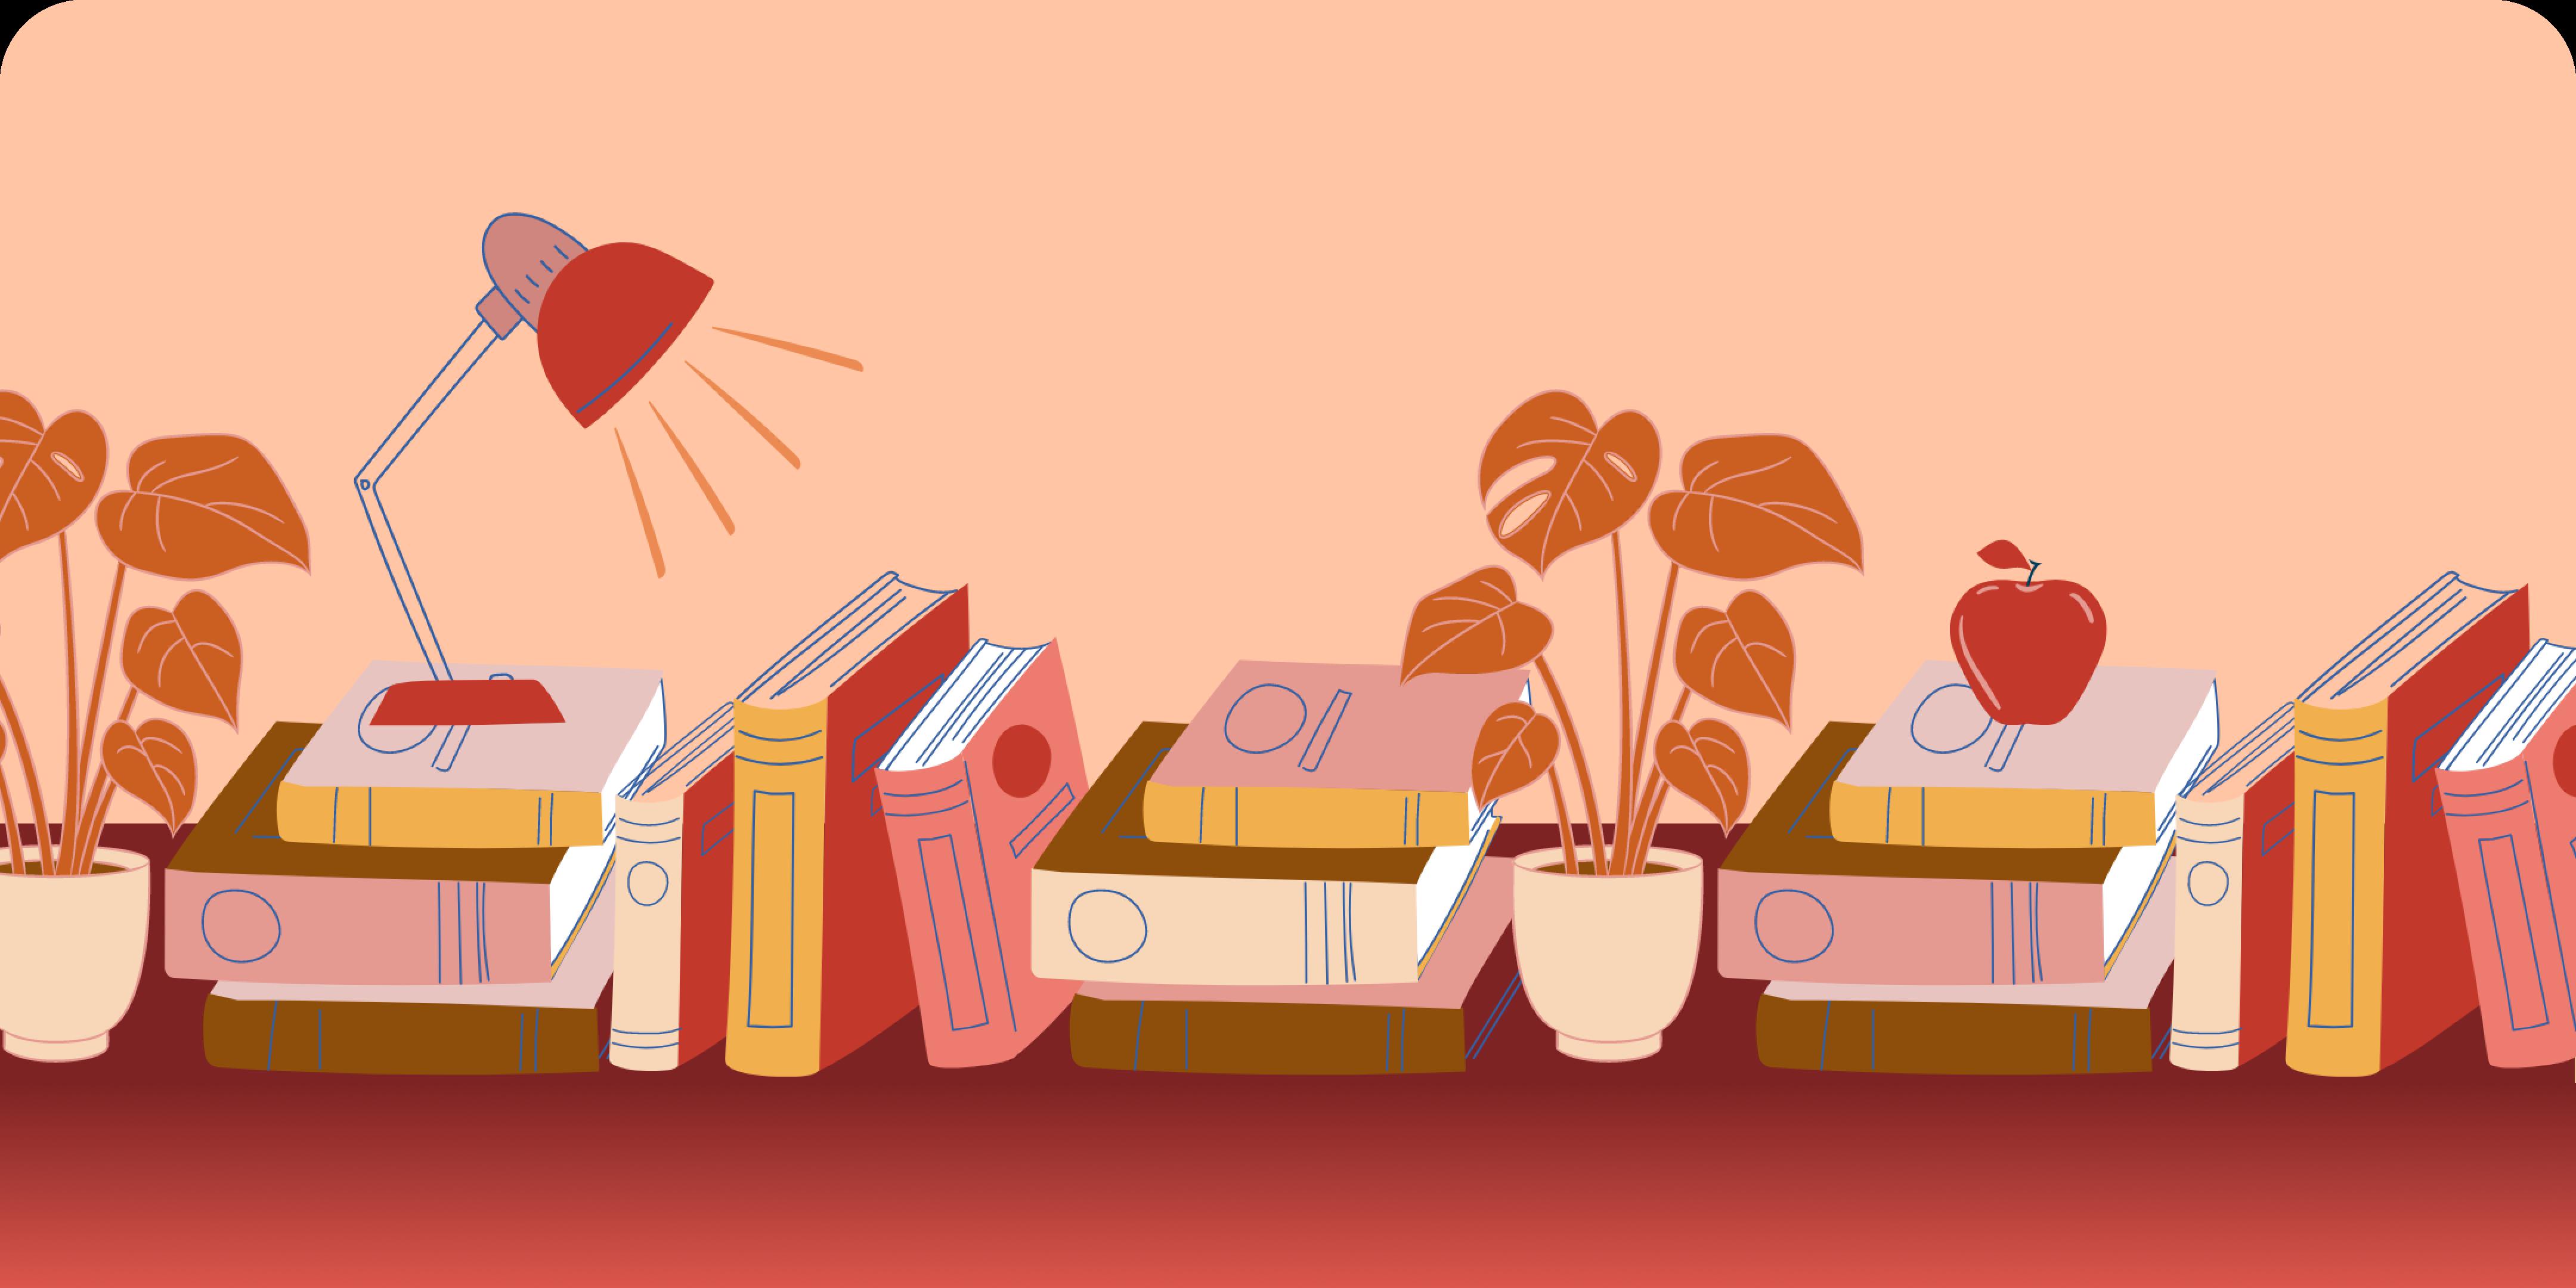 Orange plants next to piles of books